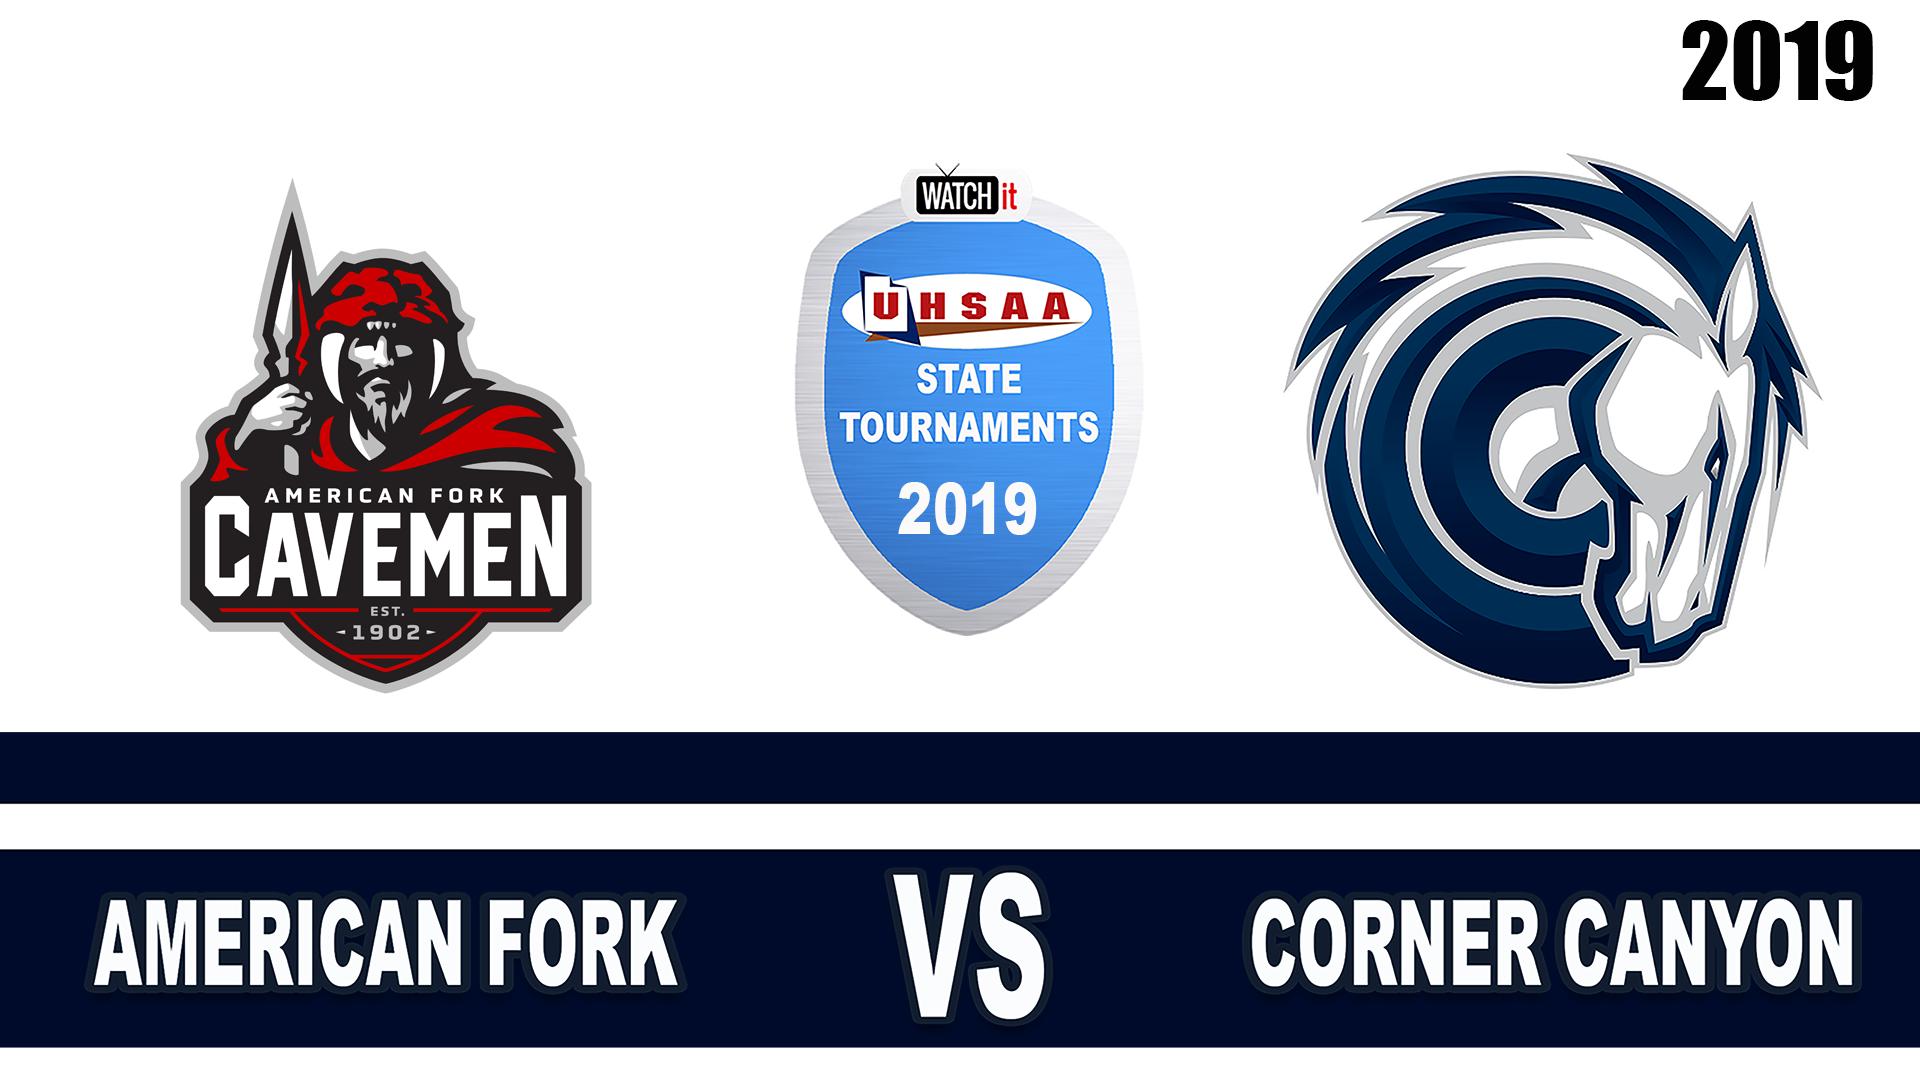 American Fork vs Corner Canyon